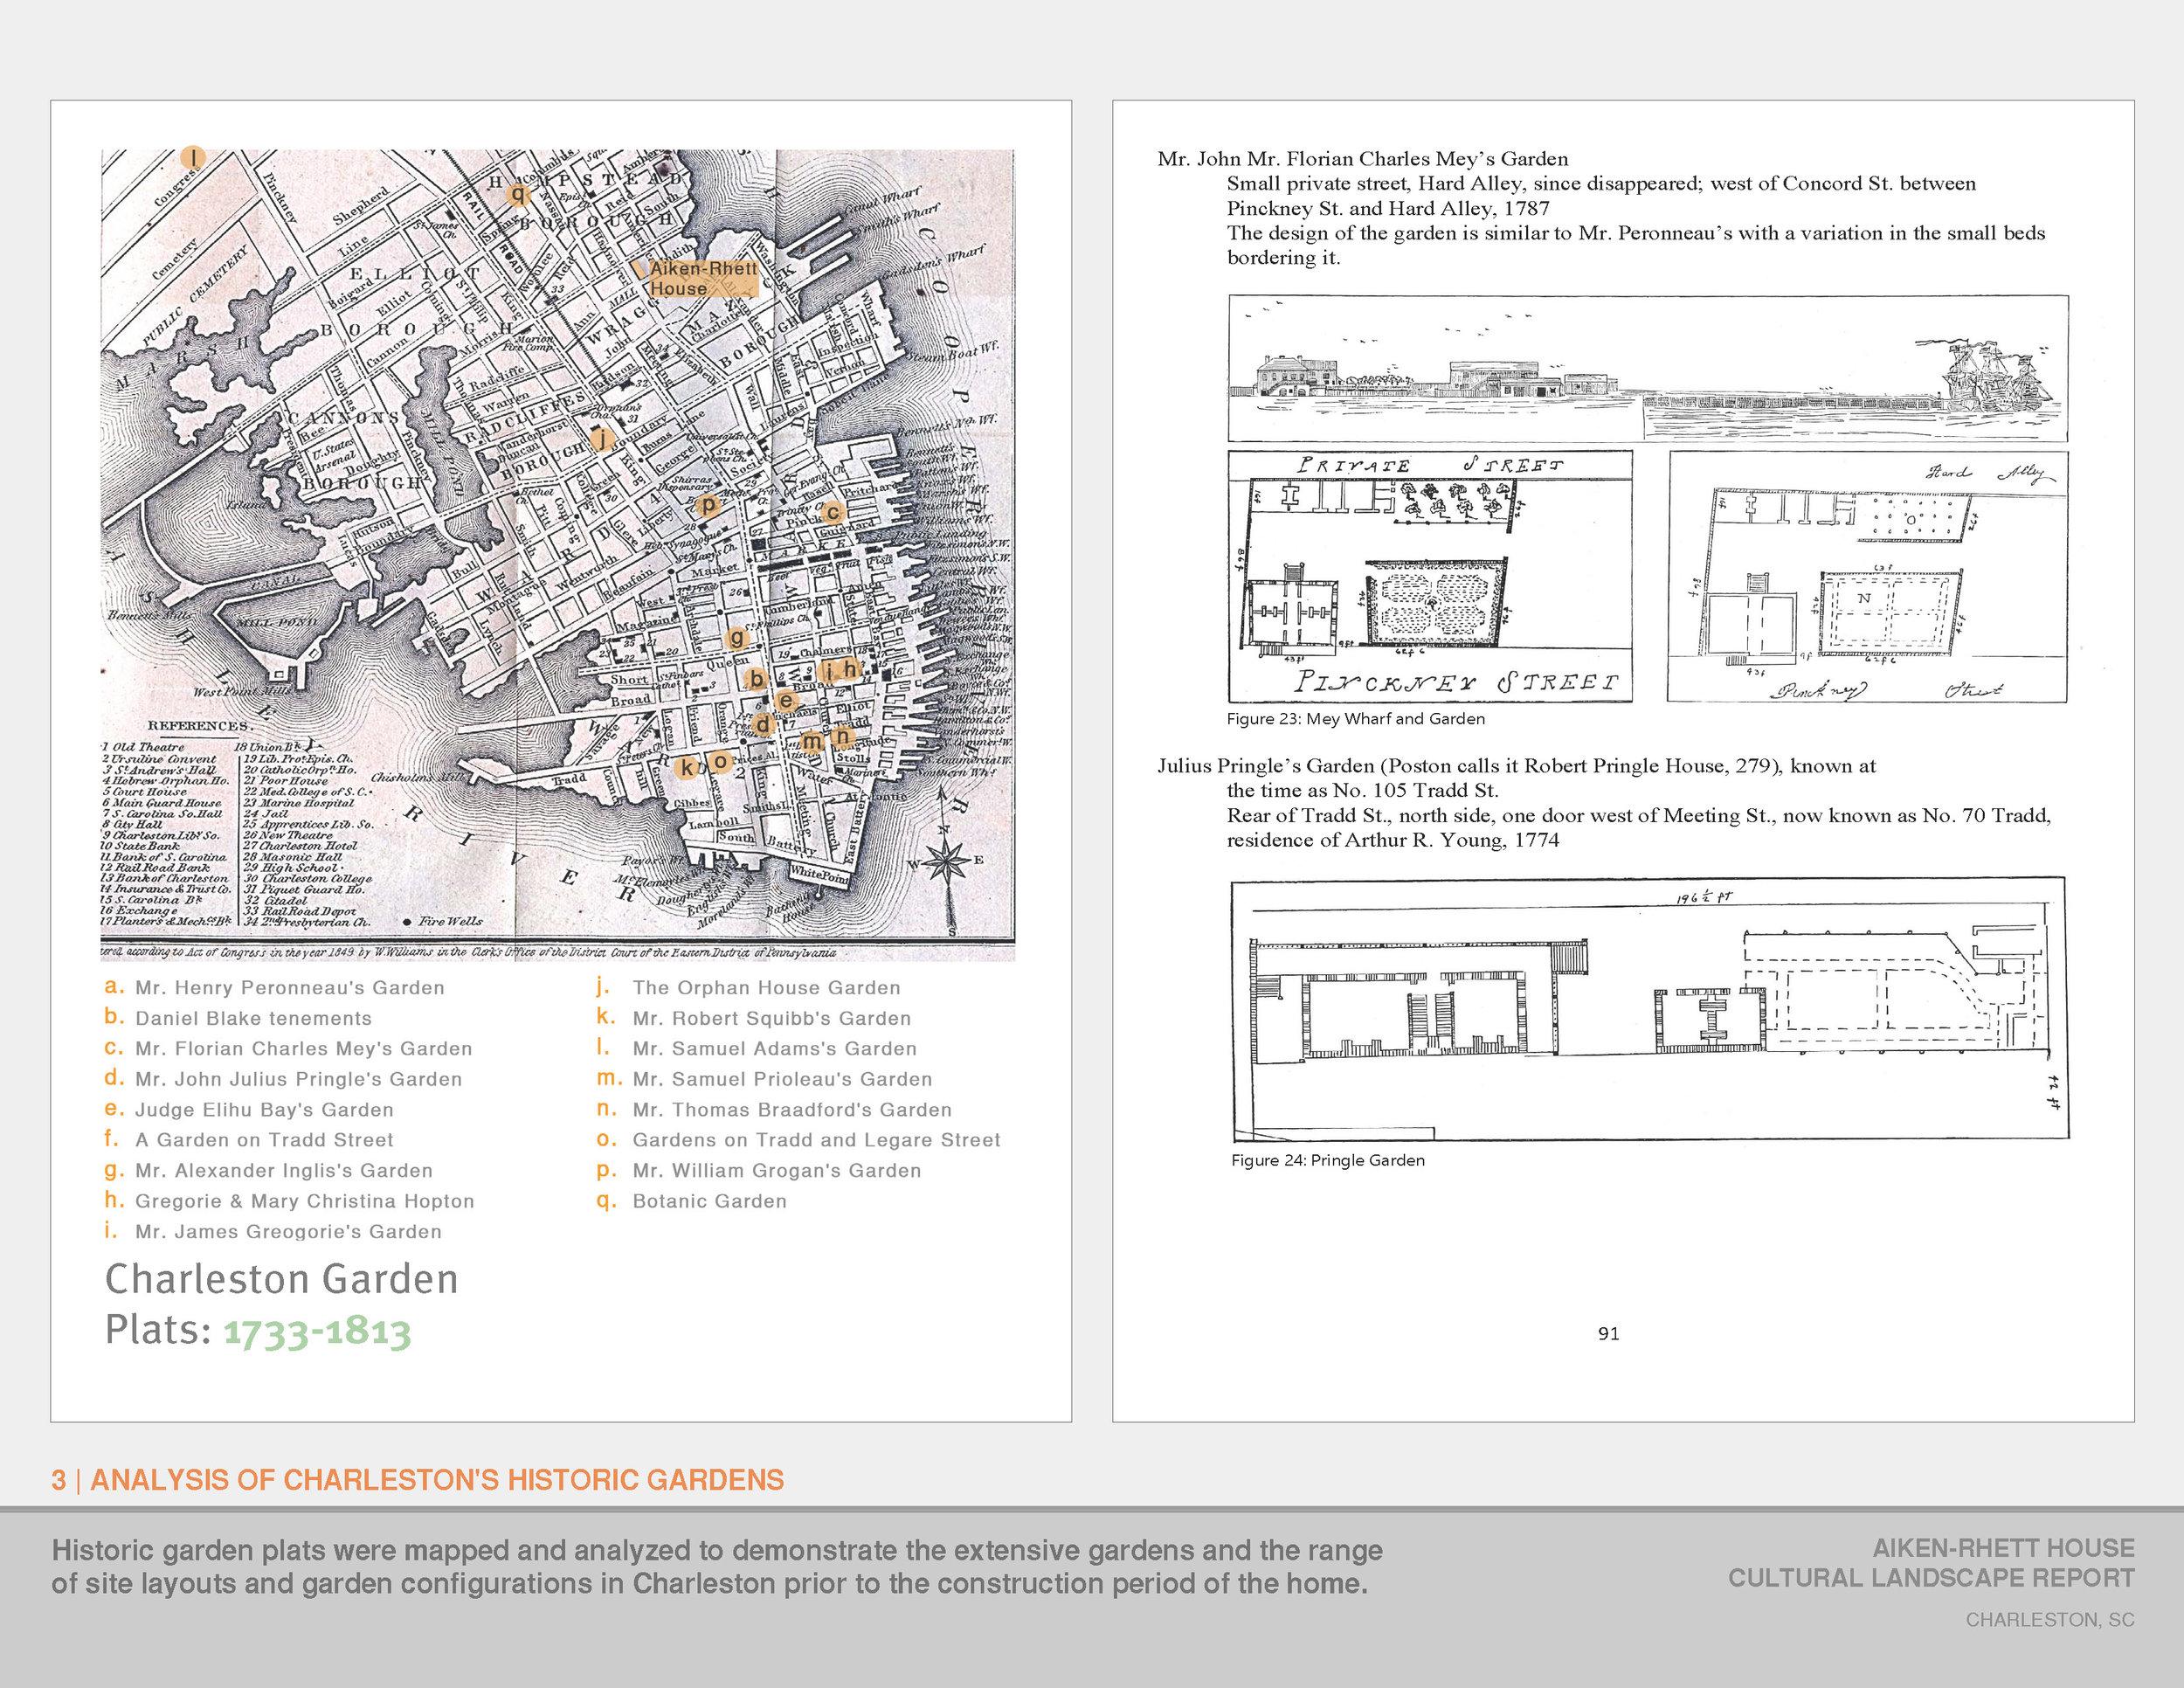 Suzanne Turner Associates - Aiken-Rhett House Report_Page_03.jpg